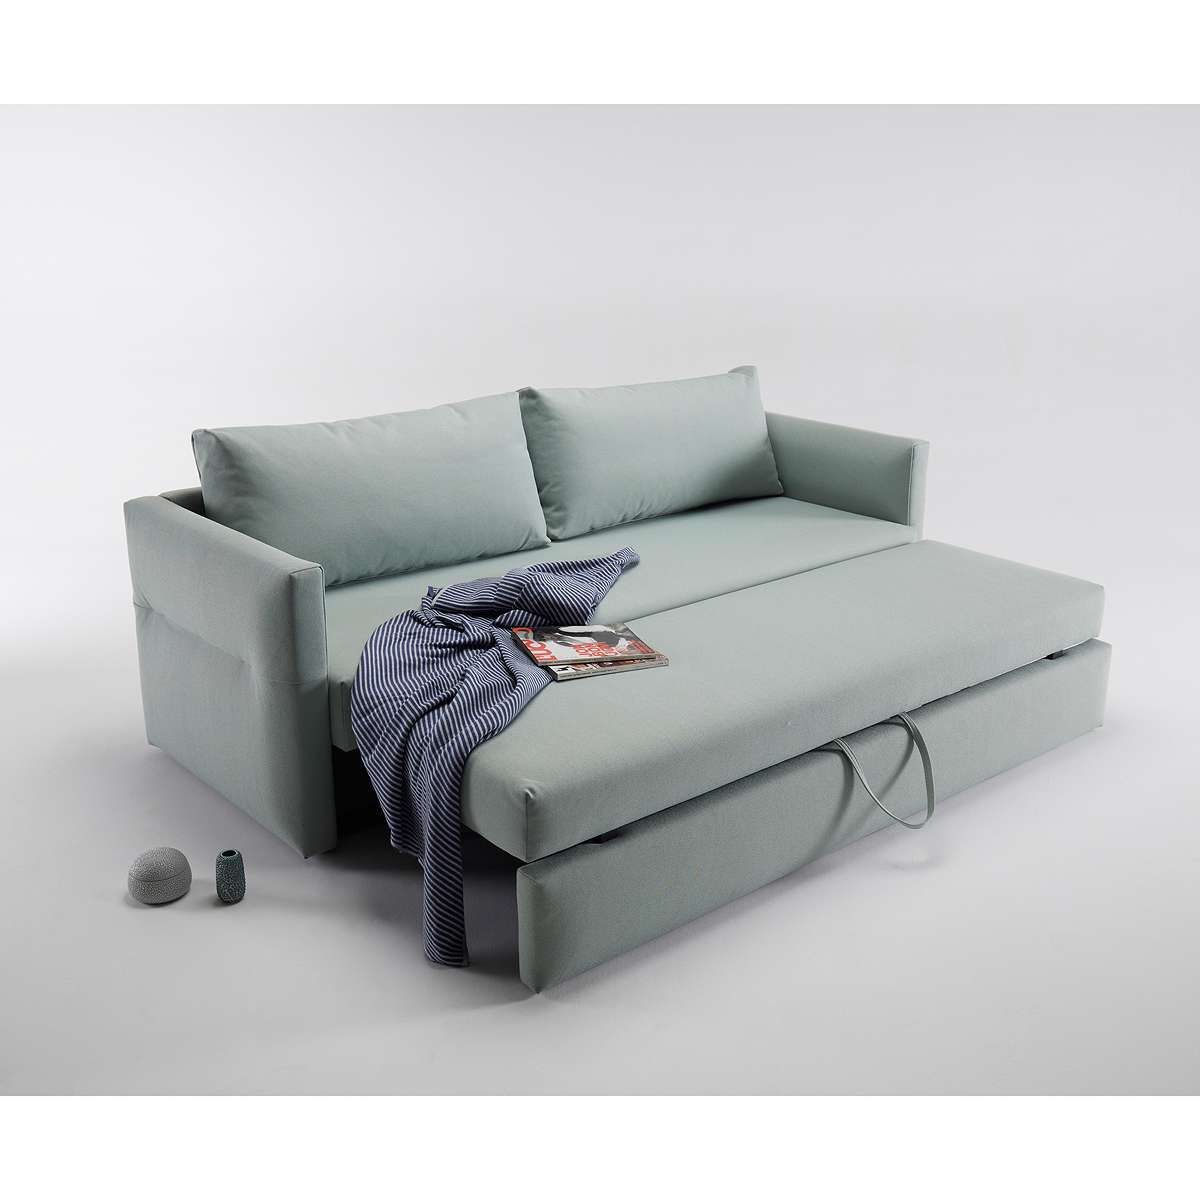 Toke Sofa By Innovation Usa Smart Furniture Cheap Sofa Beds